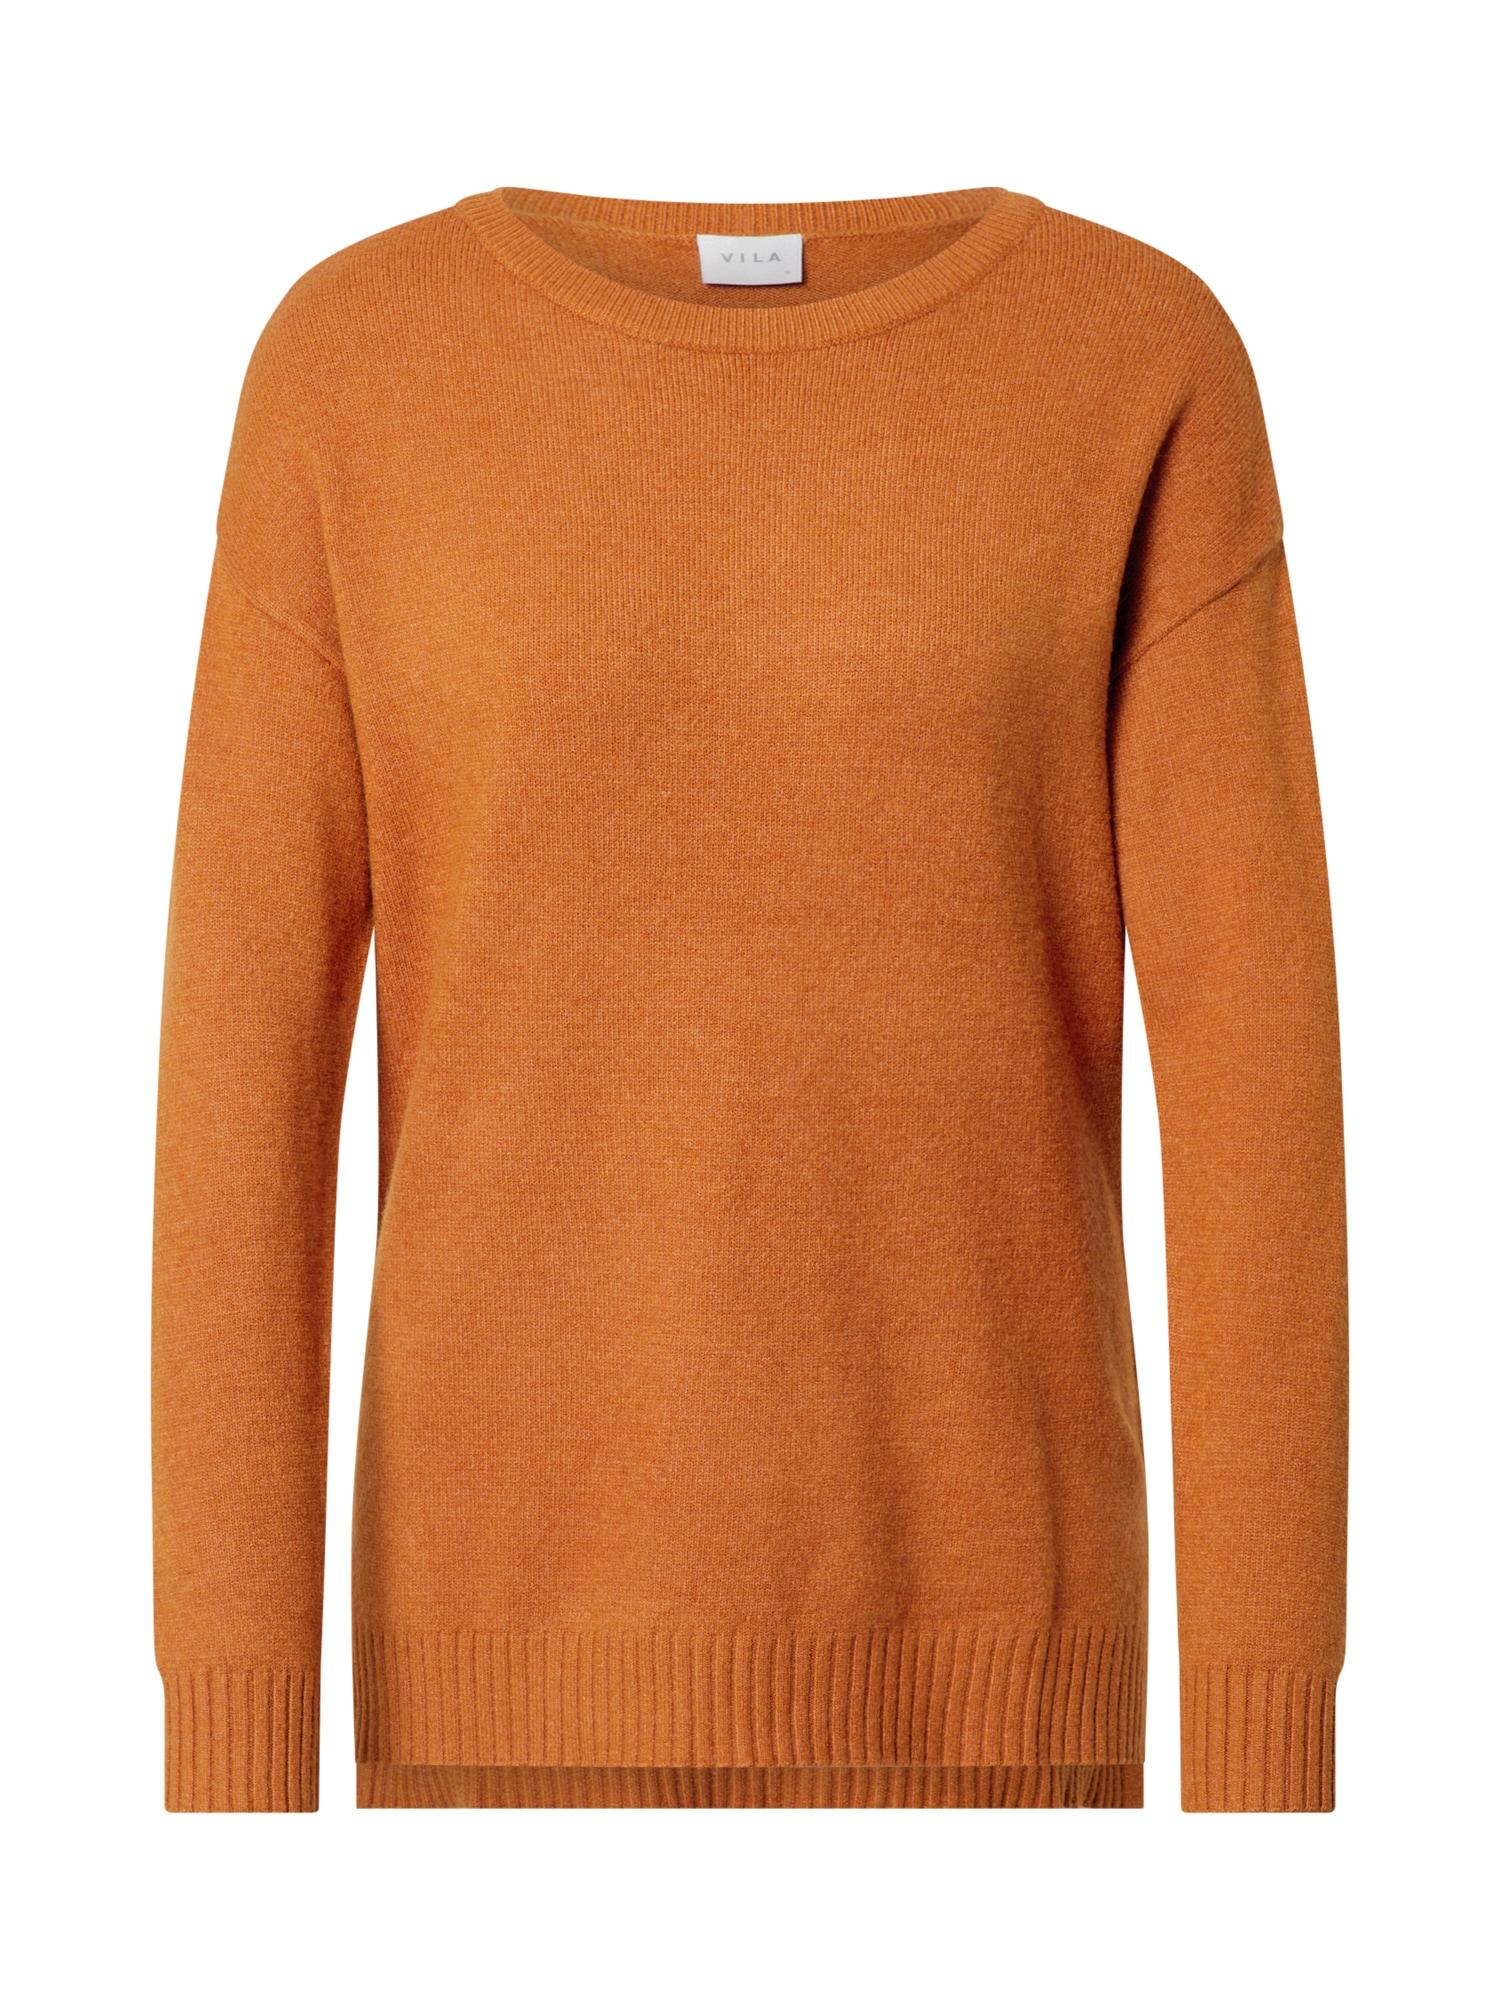 VILA Megztinis kario spalva